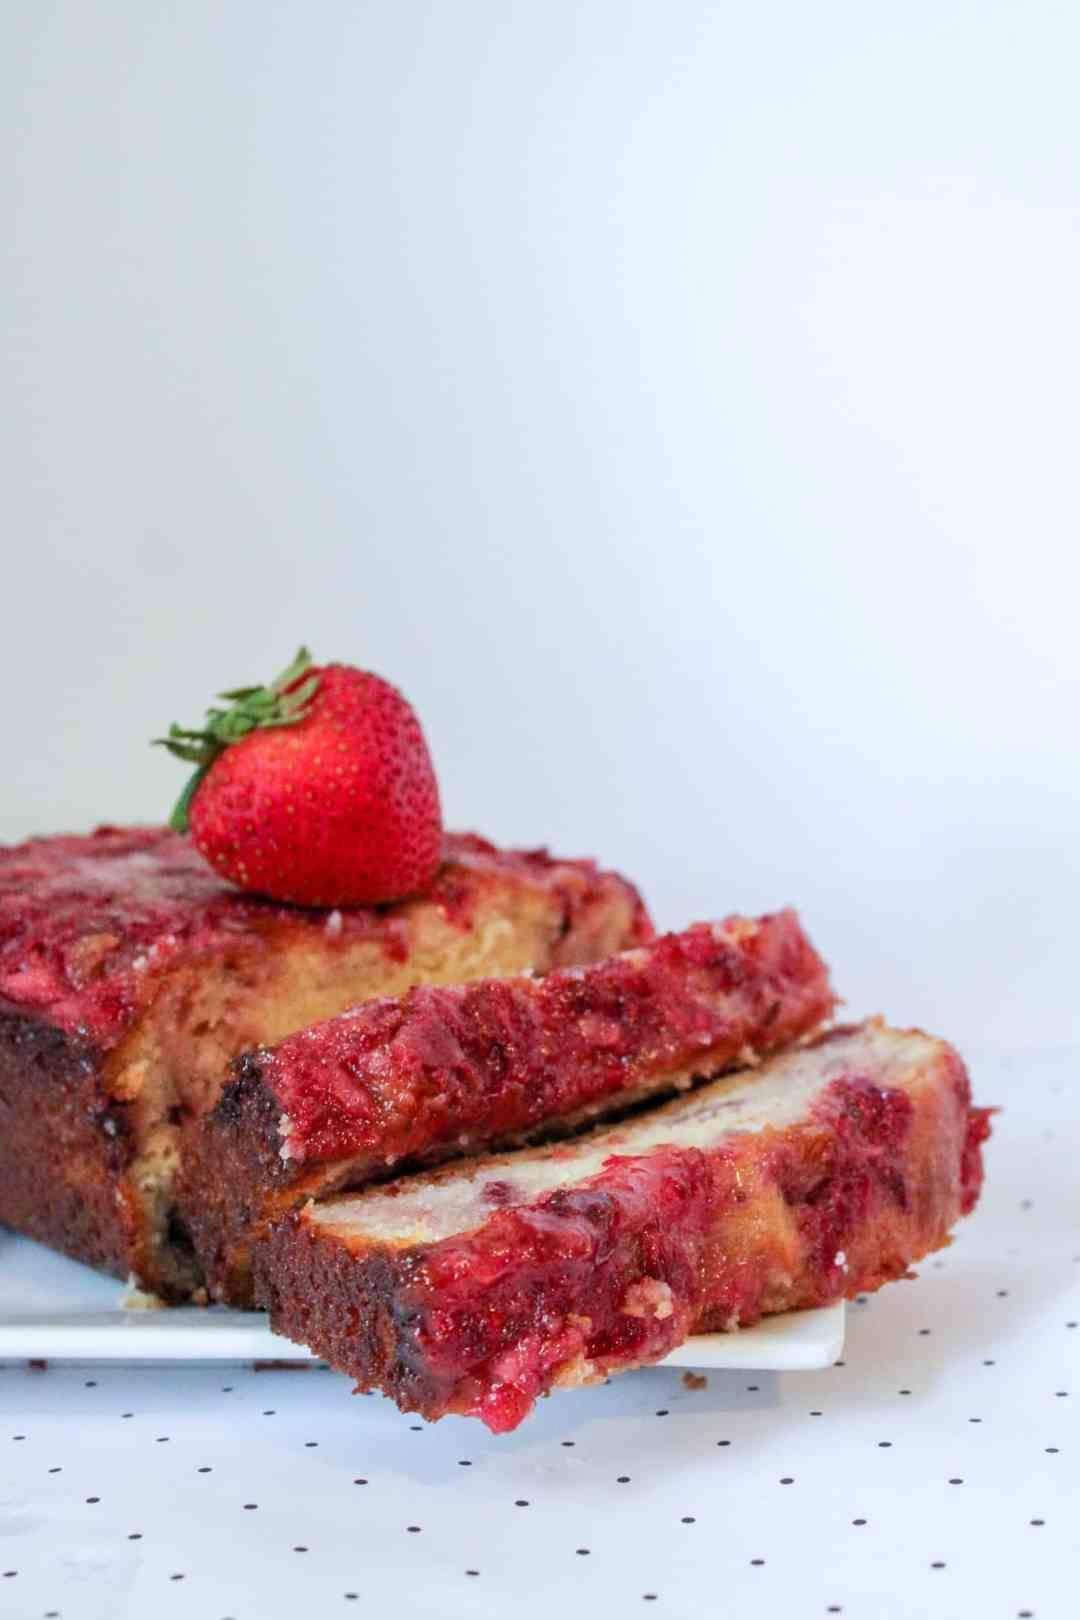 fresh strawberry pound cake on table